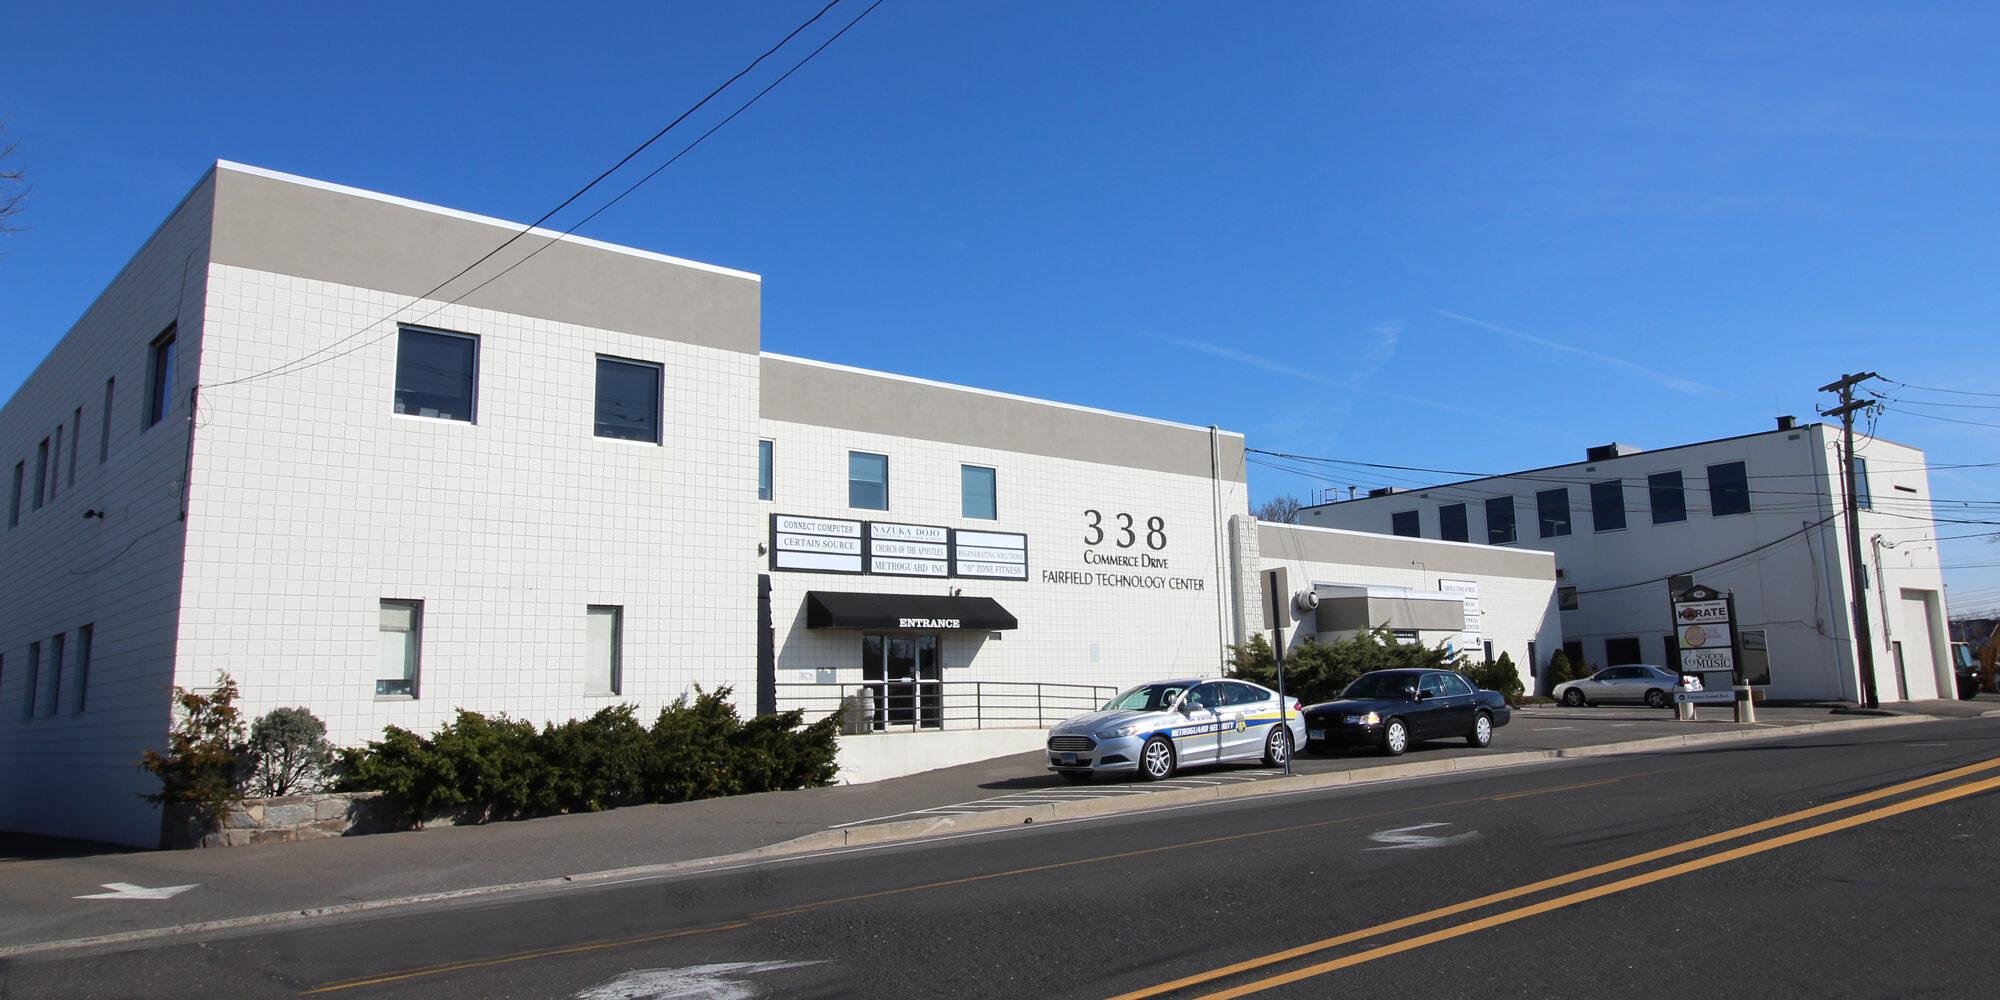 328 & 338 Commerce Drive, Fairfield, CT